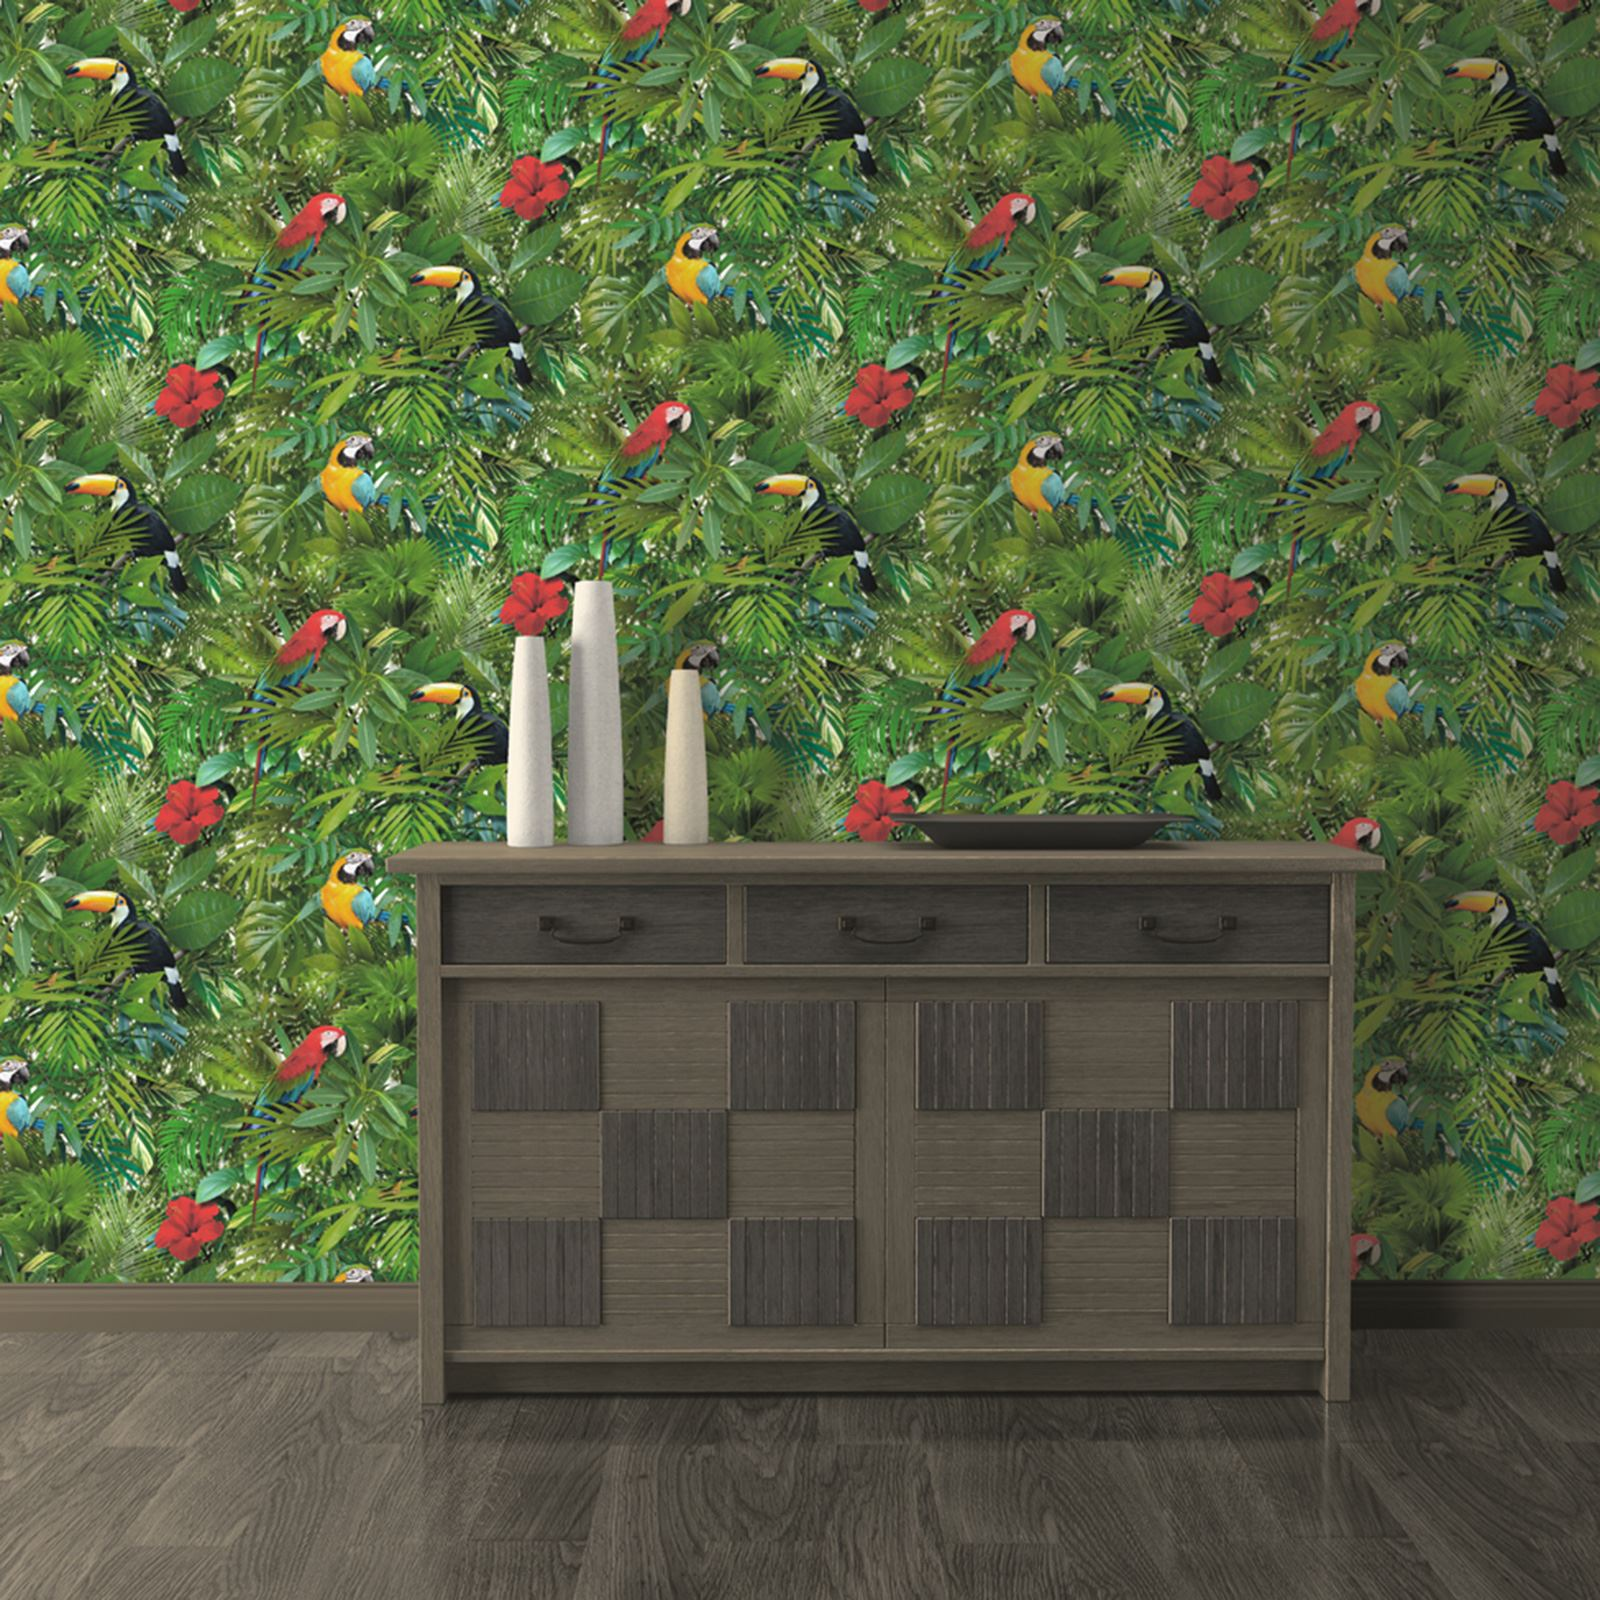 tropical bird wallpaper for walls - photo #36